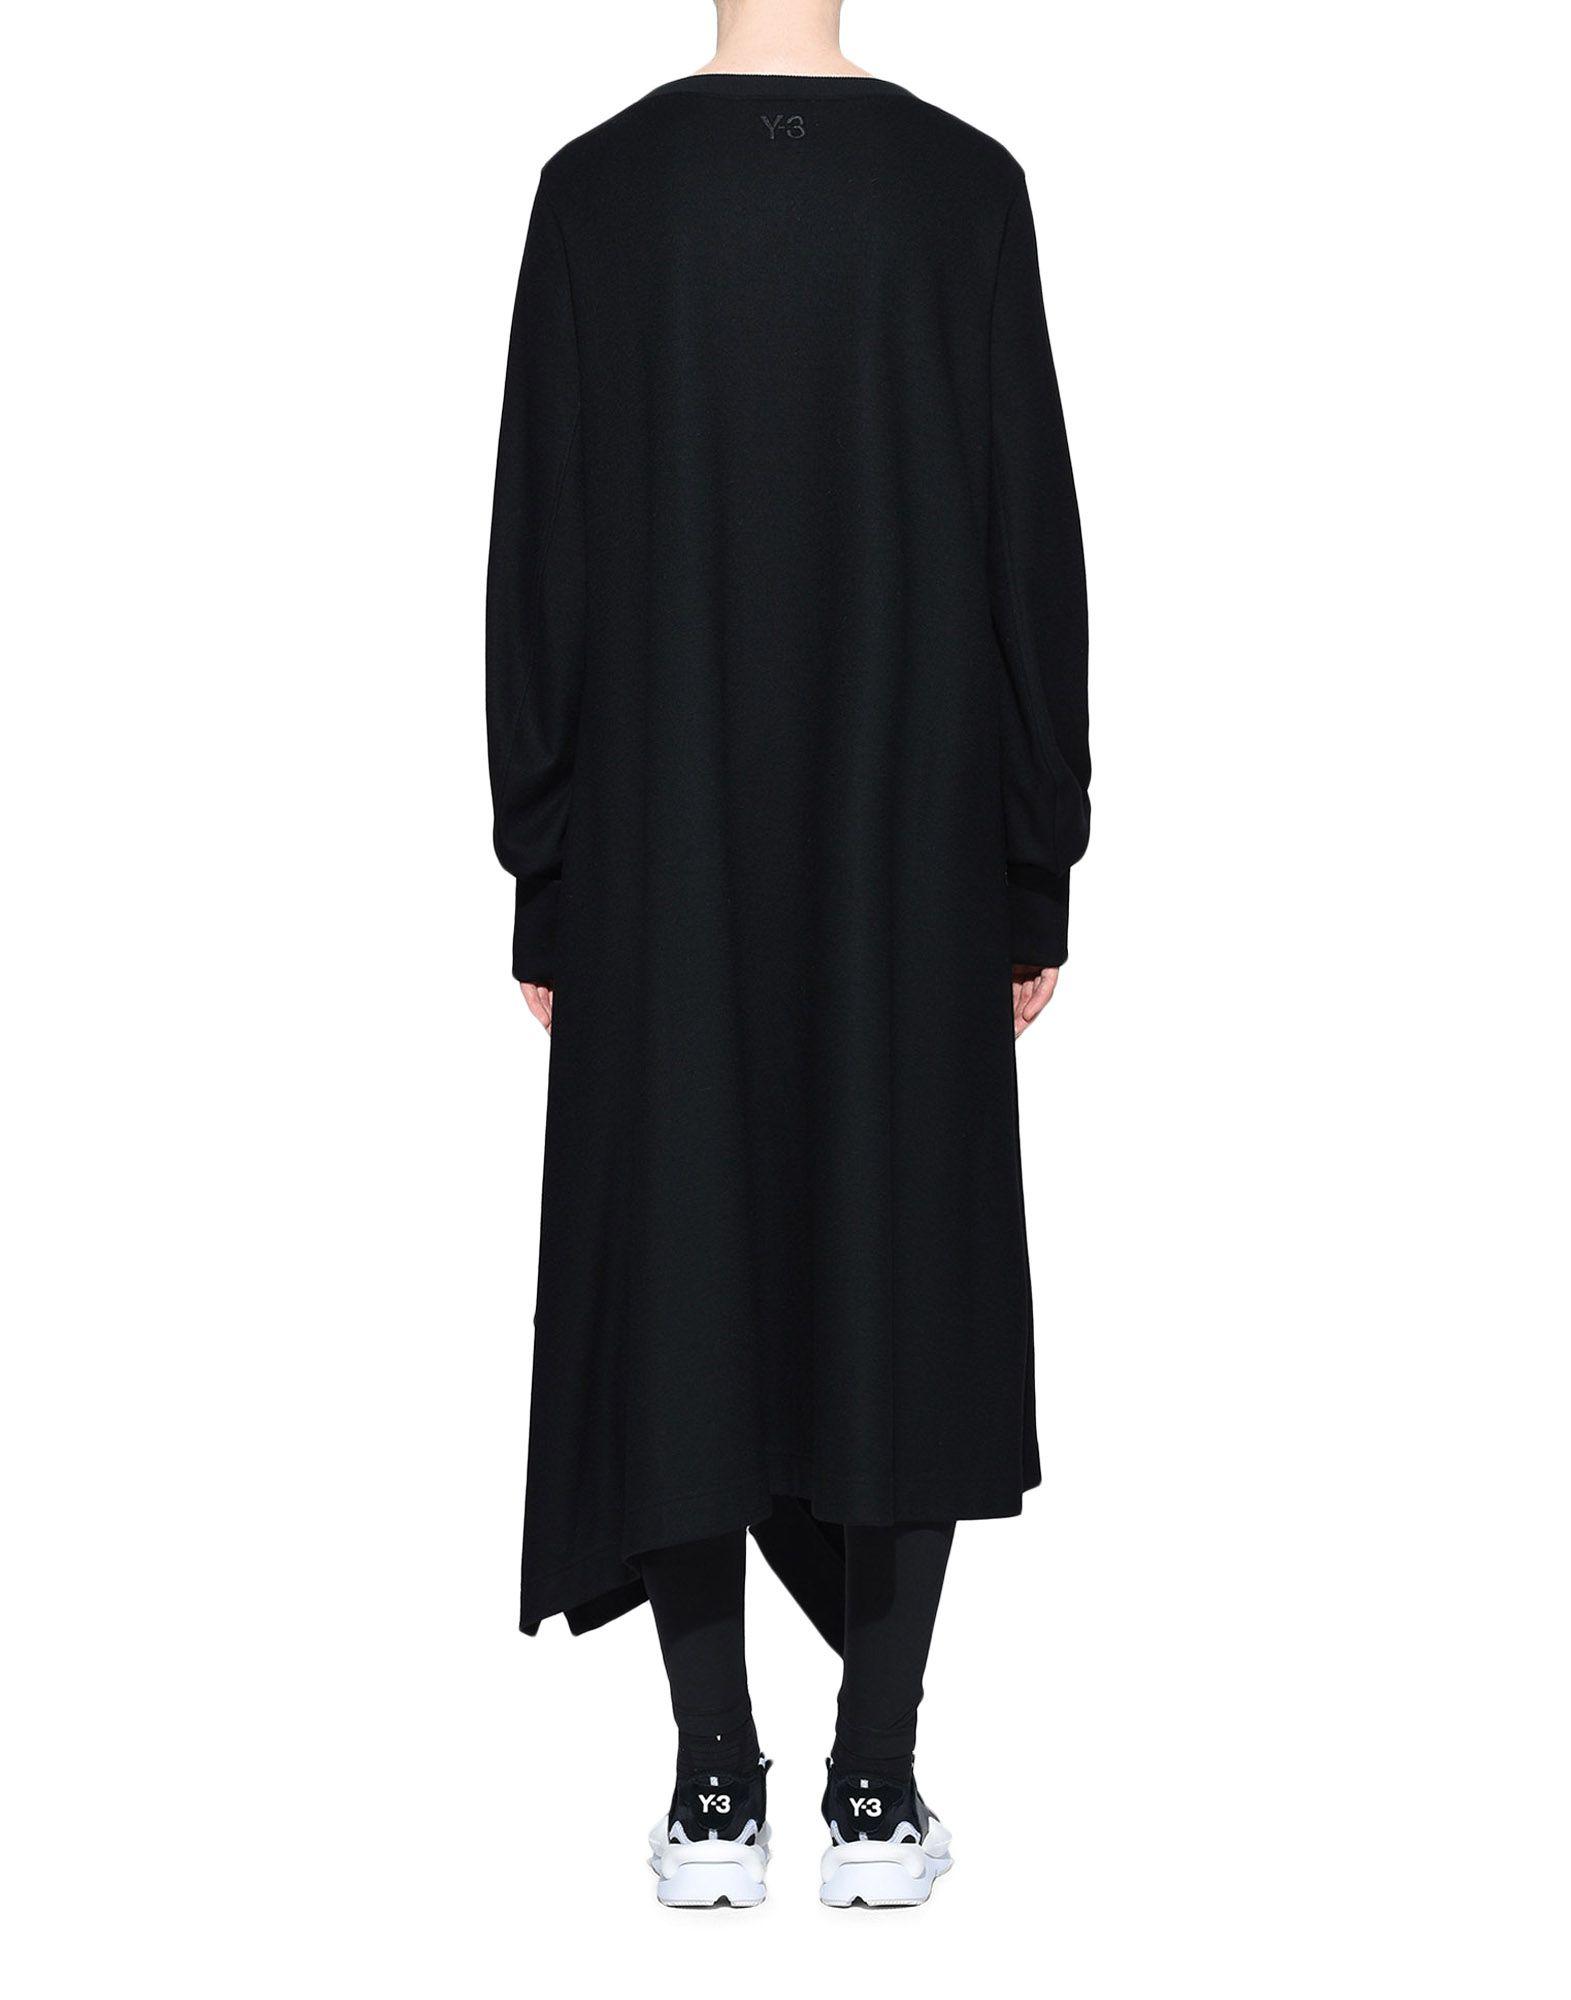 Y-3 Y-3 Wool Dress Robe longue Femme d